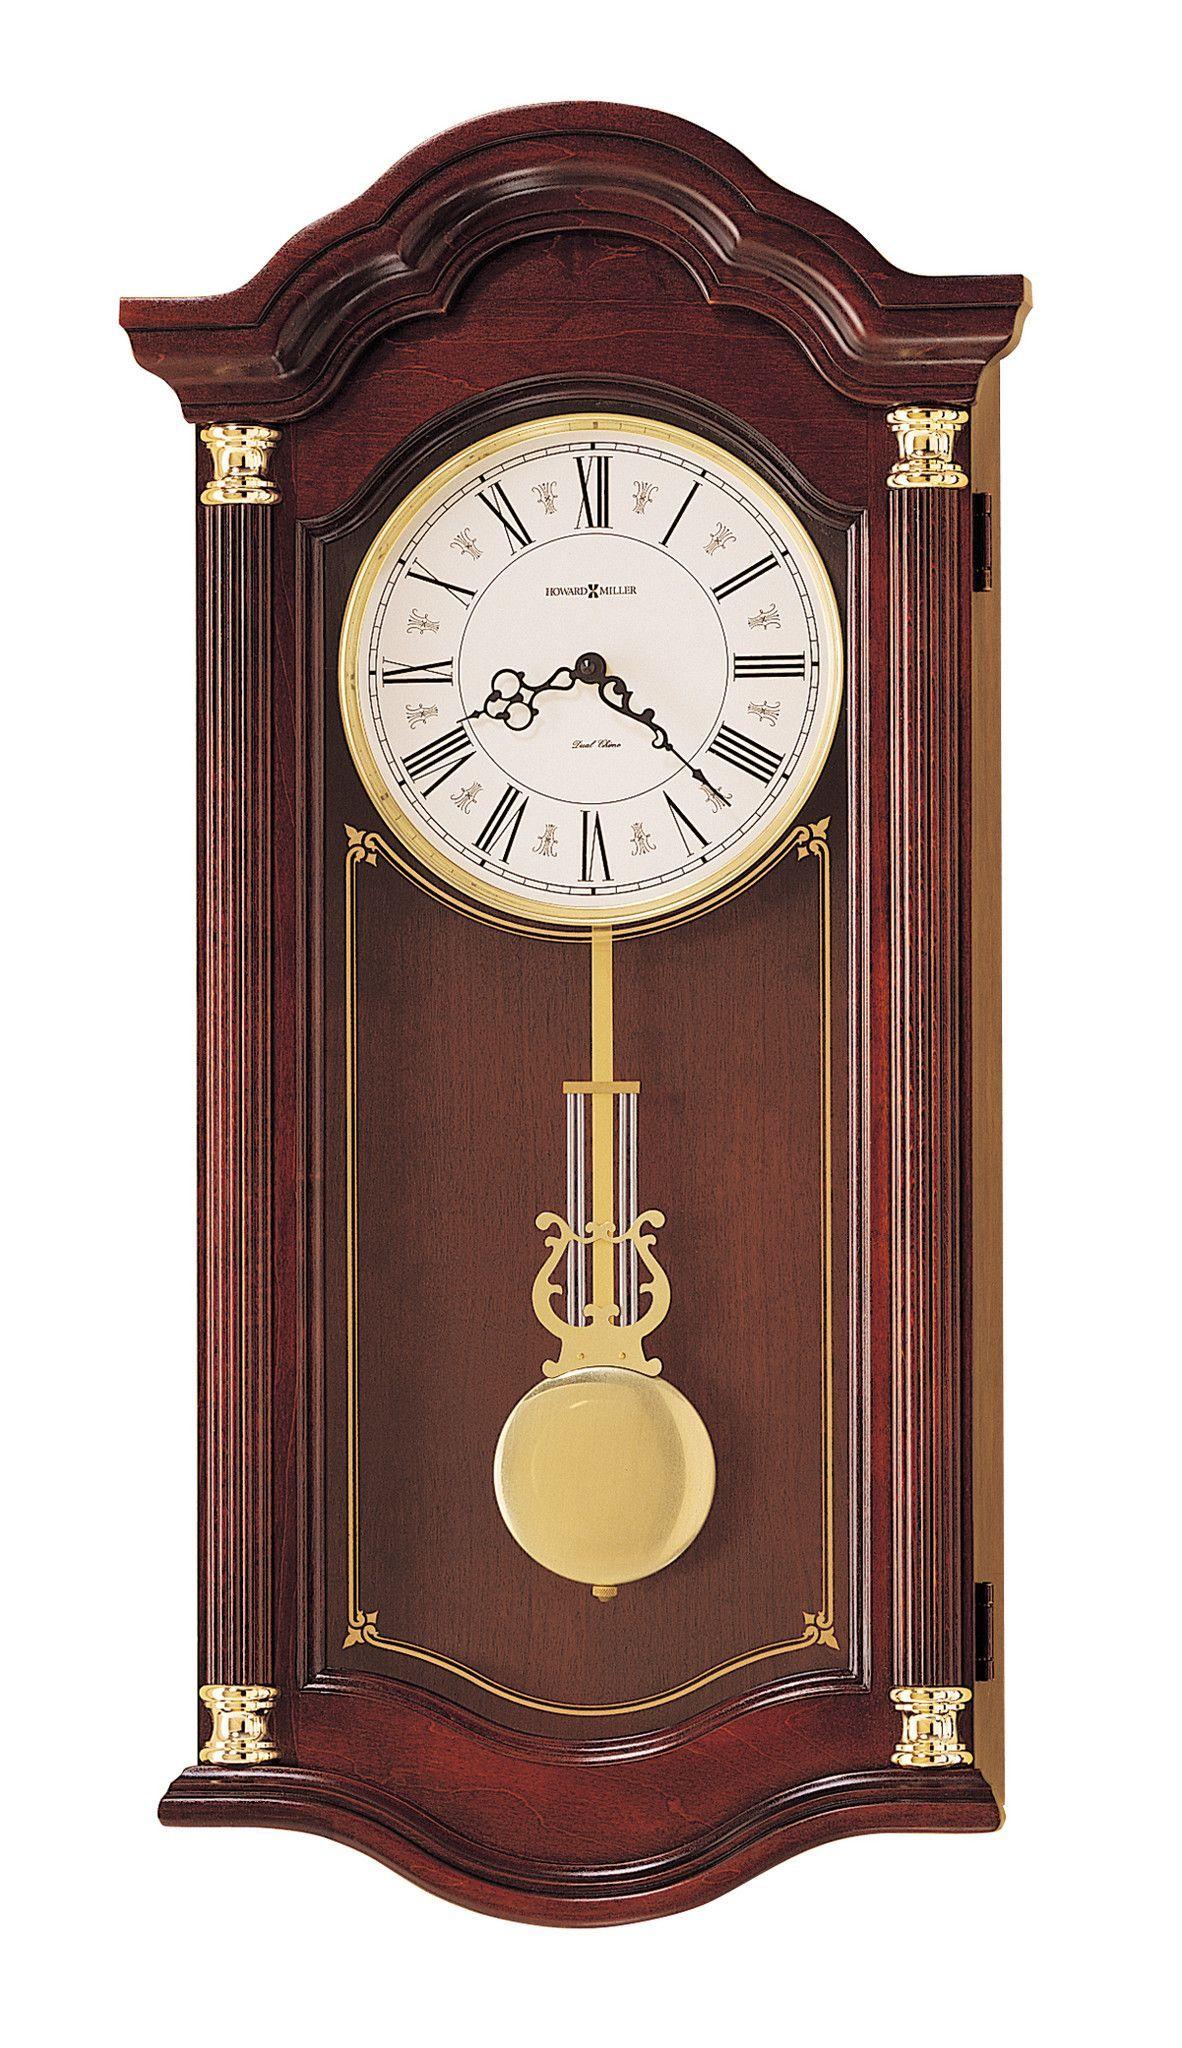 Lambourn Wall Clock đồng Hồ